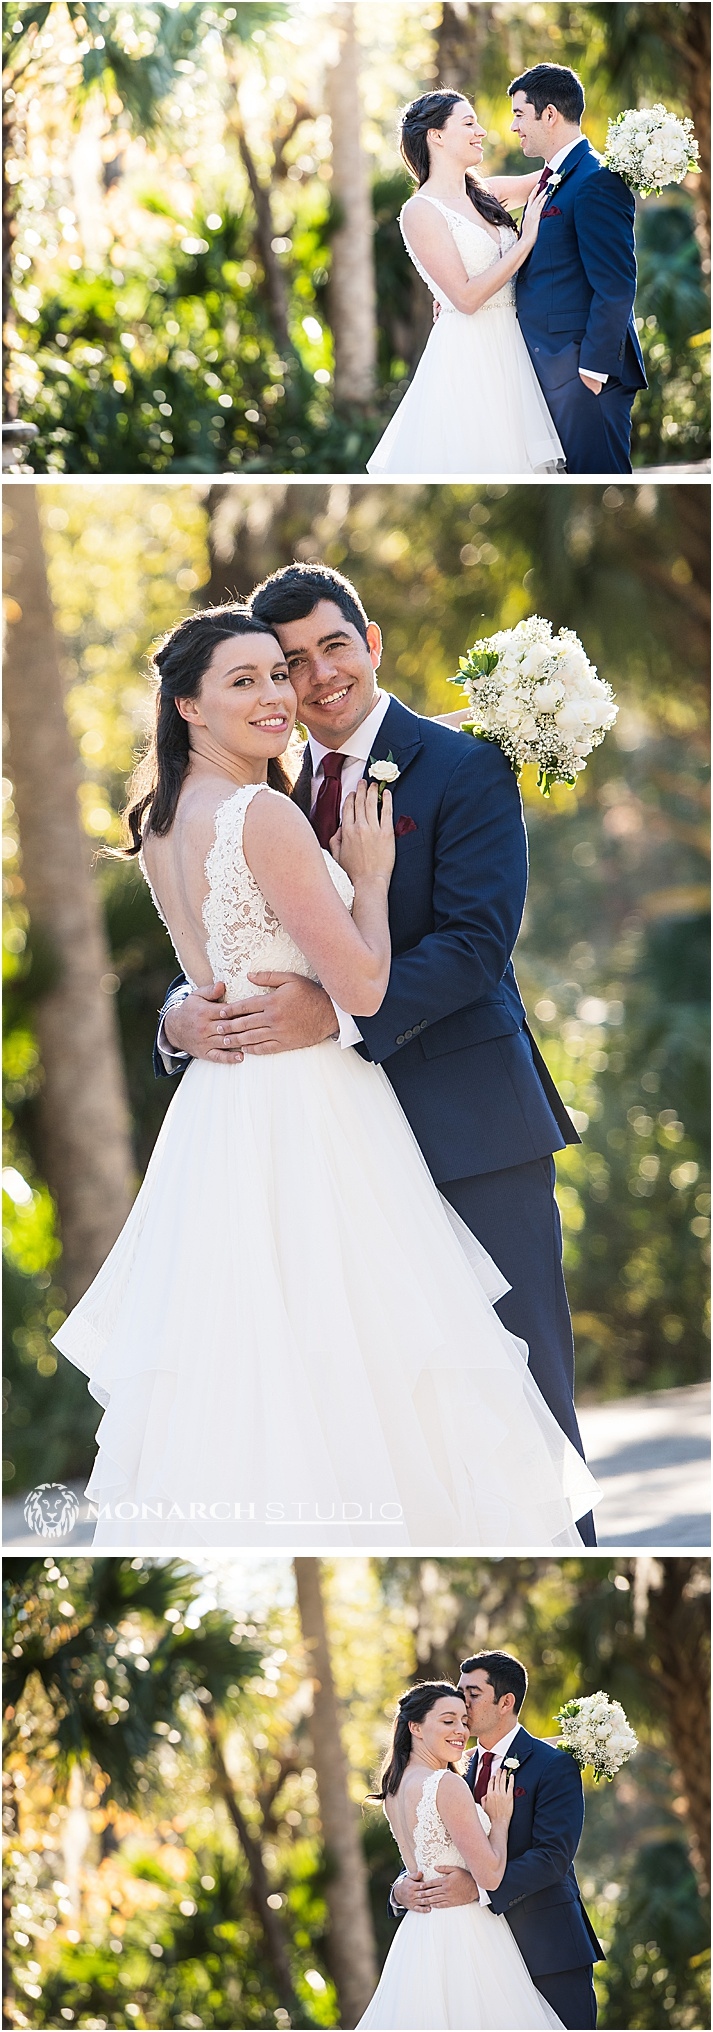 Wedding-photographer-in-sanford-florida-natural-wedding-024.jpg